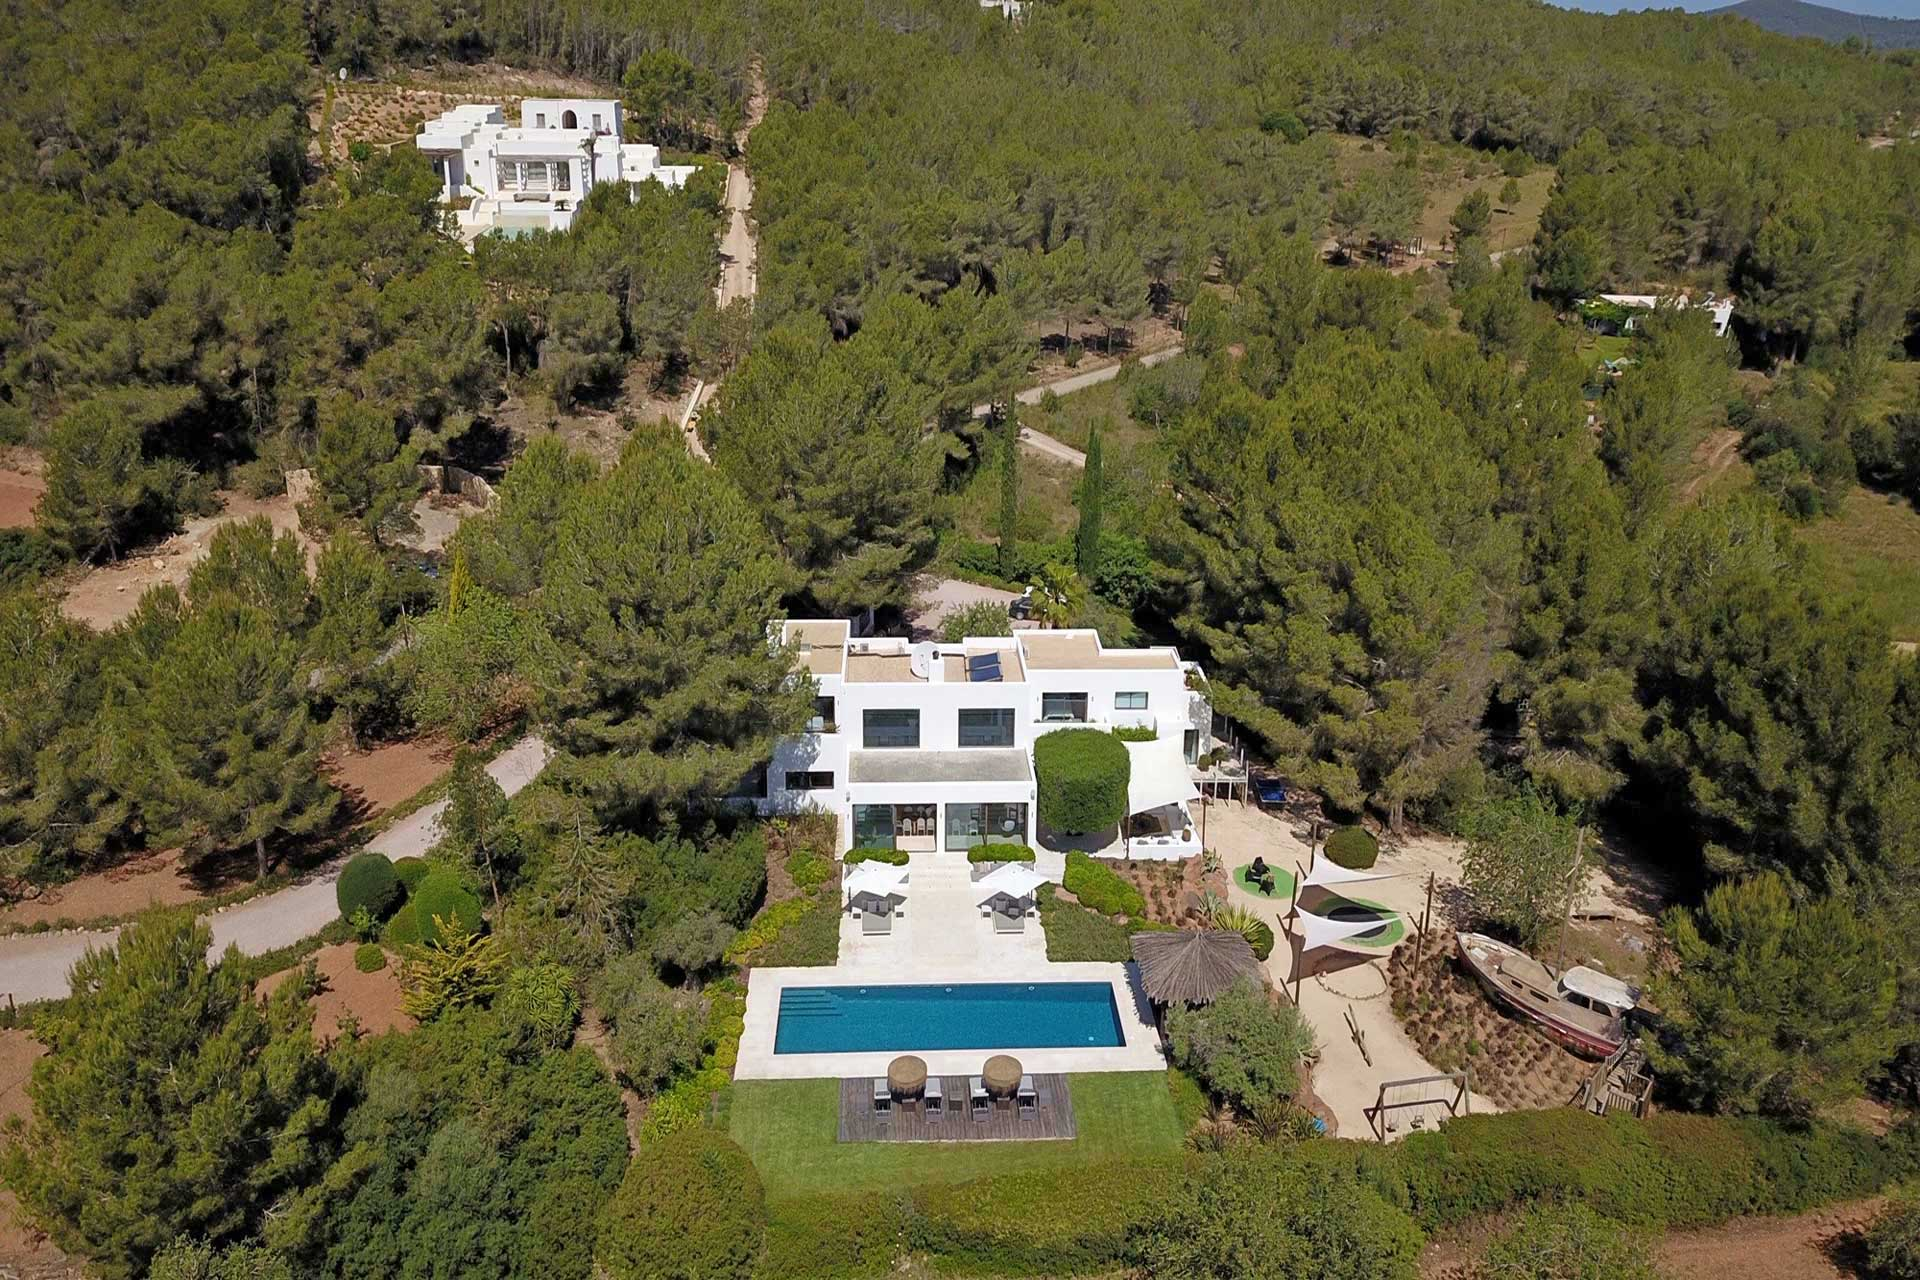 Villa Can Buu Ibiza - Aerial view